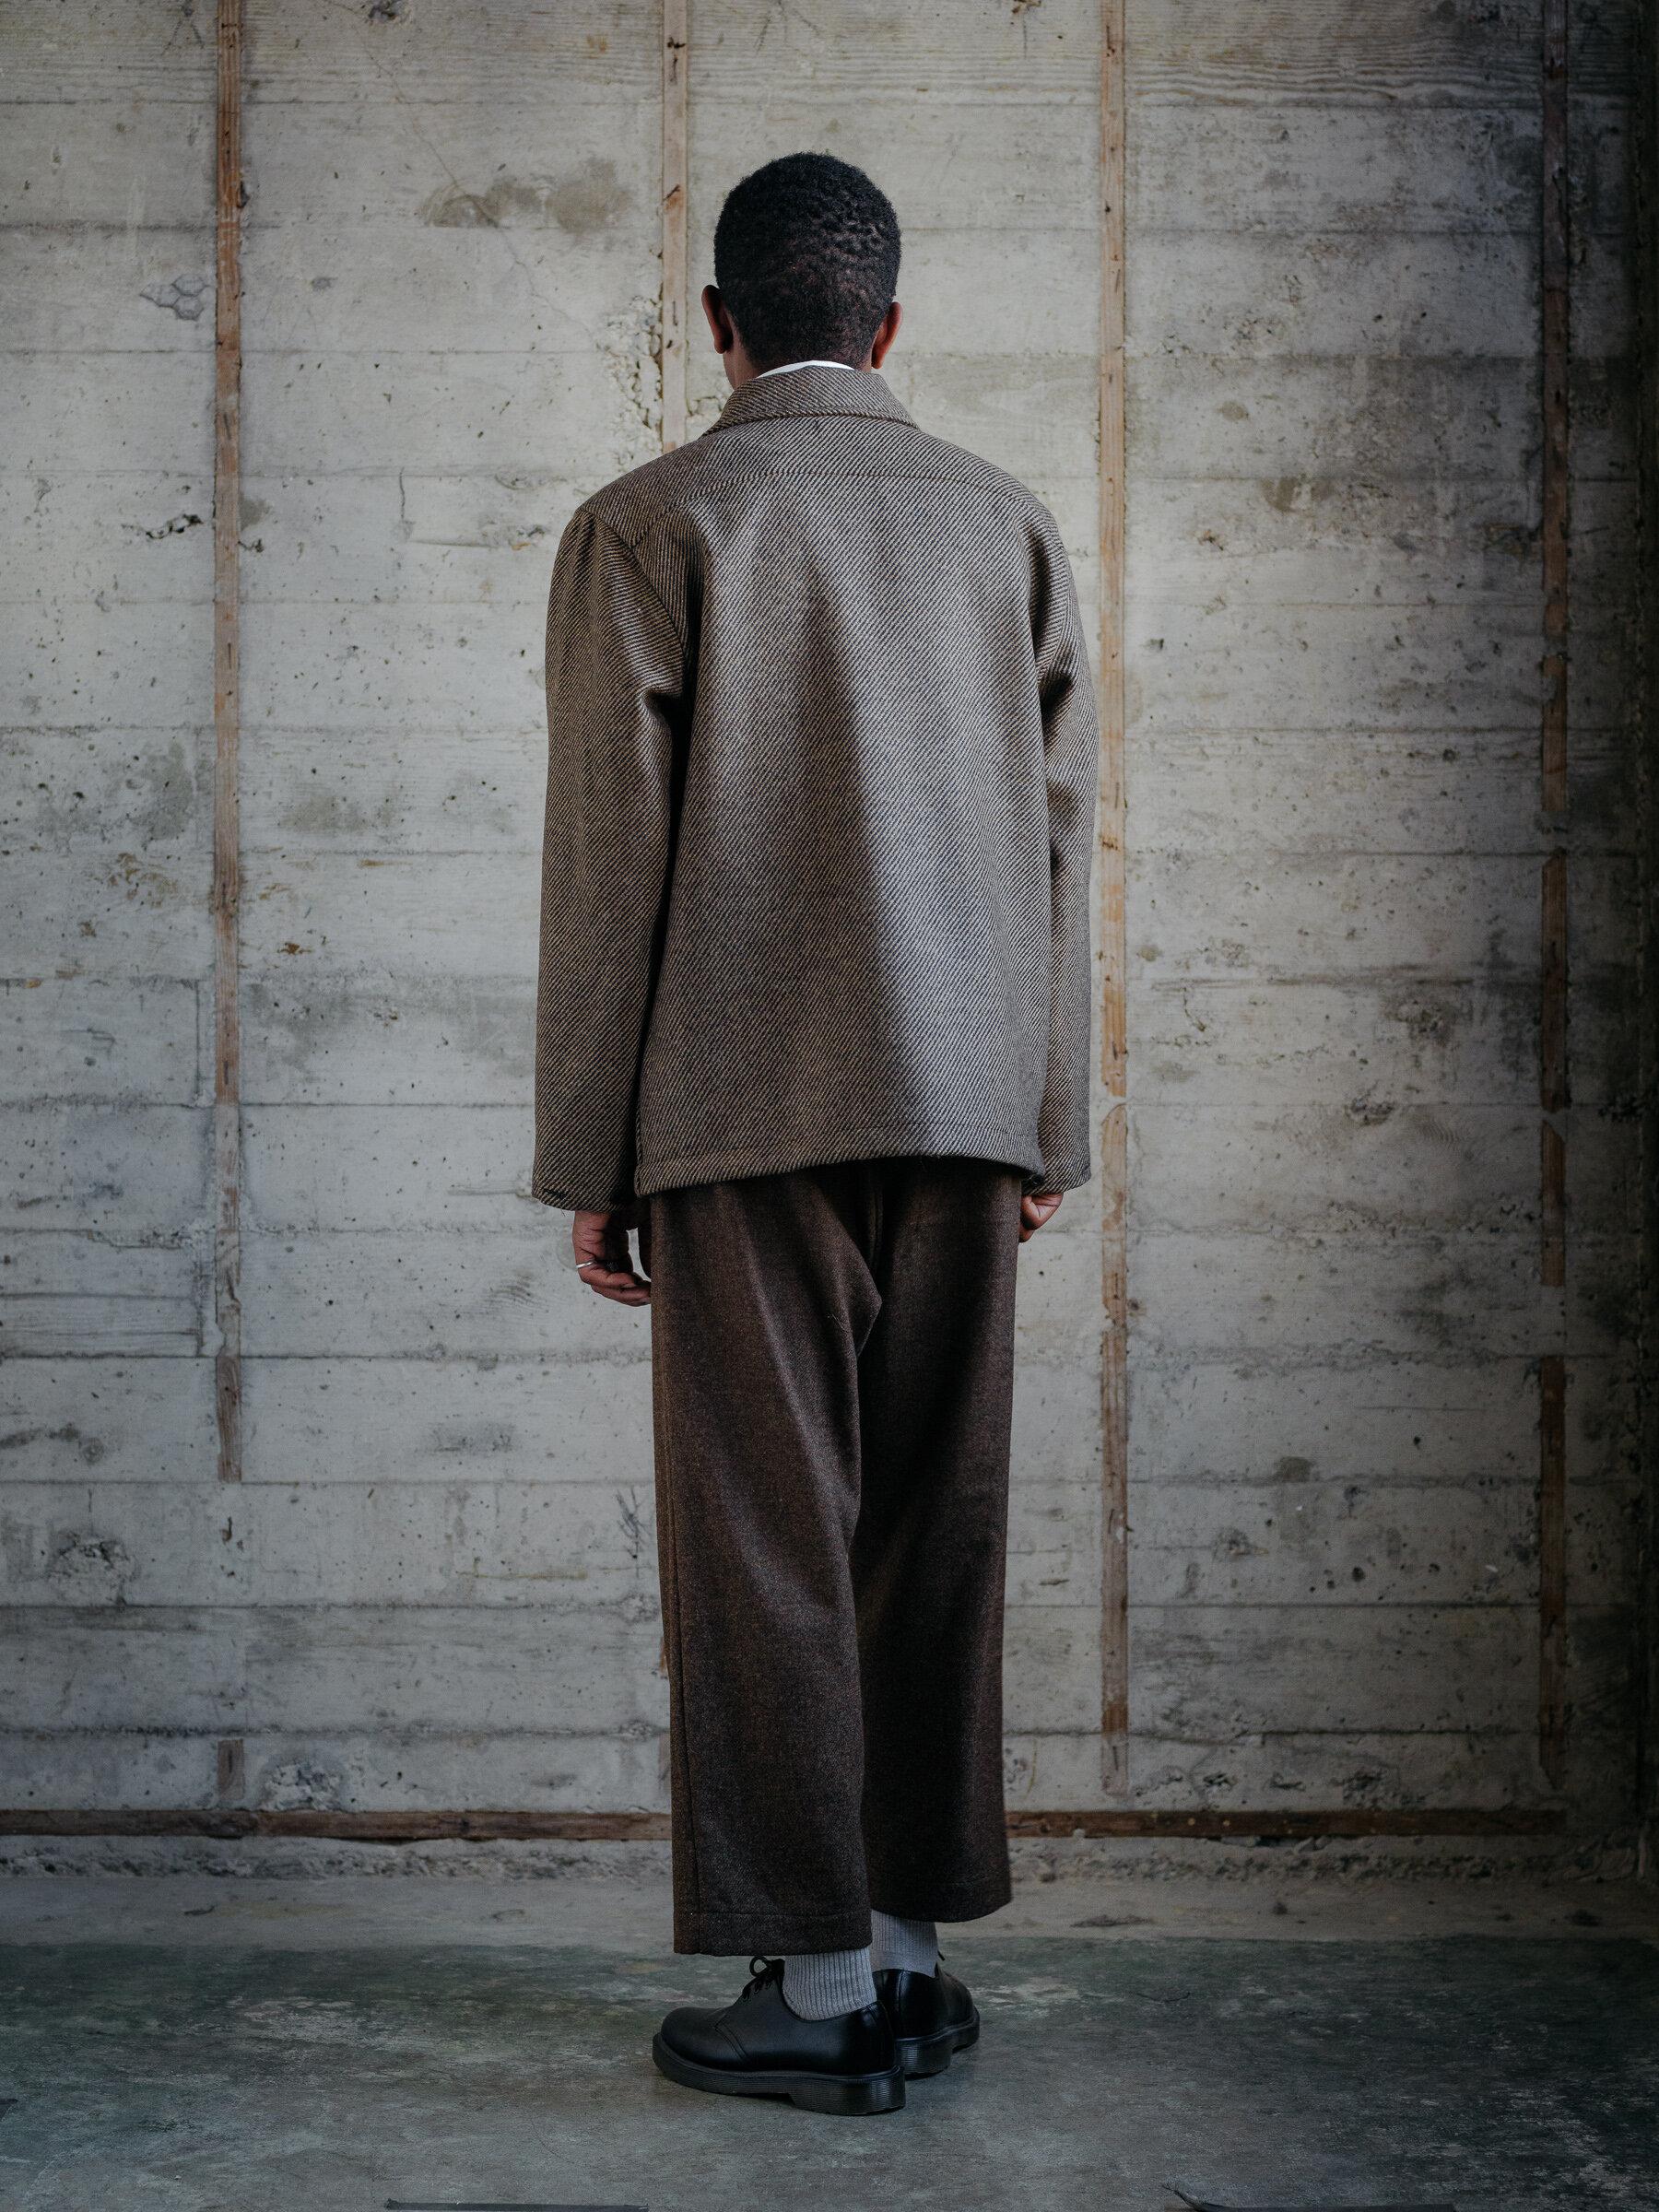 evan-kinori-bellow-pocket-jacket-lambswool-twill-woven-in-ireland-3